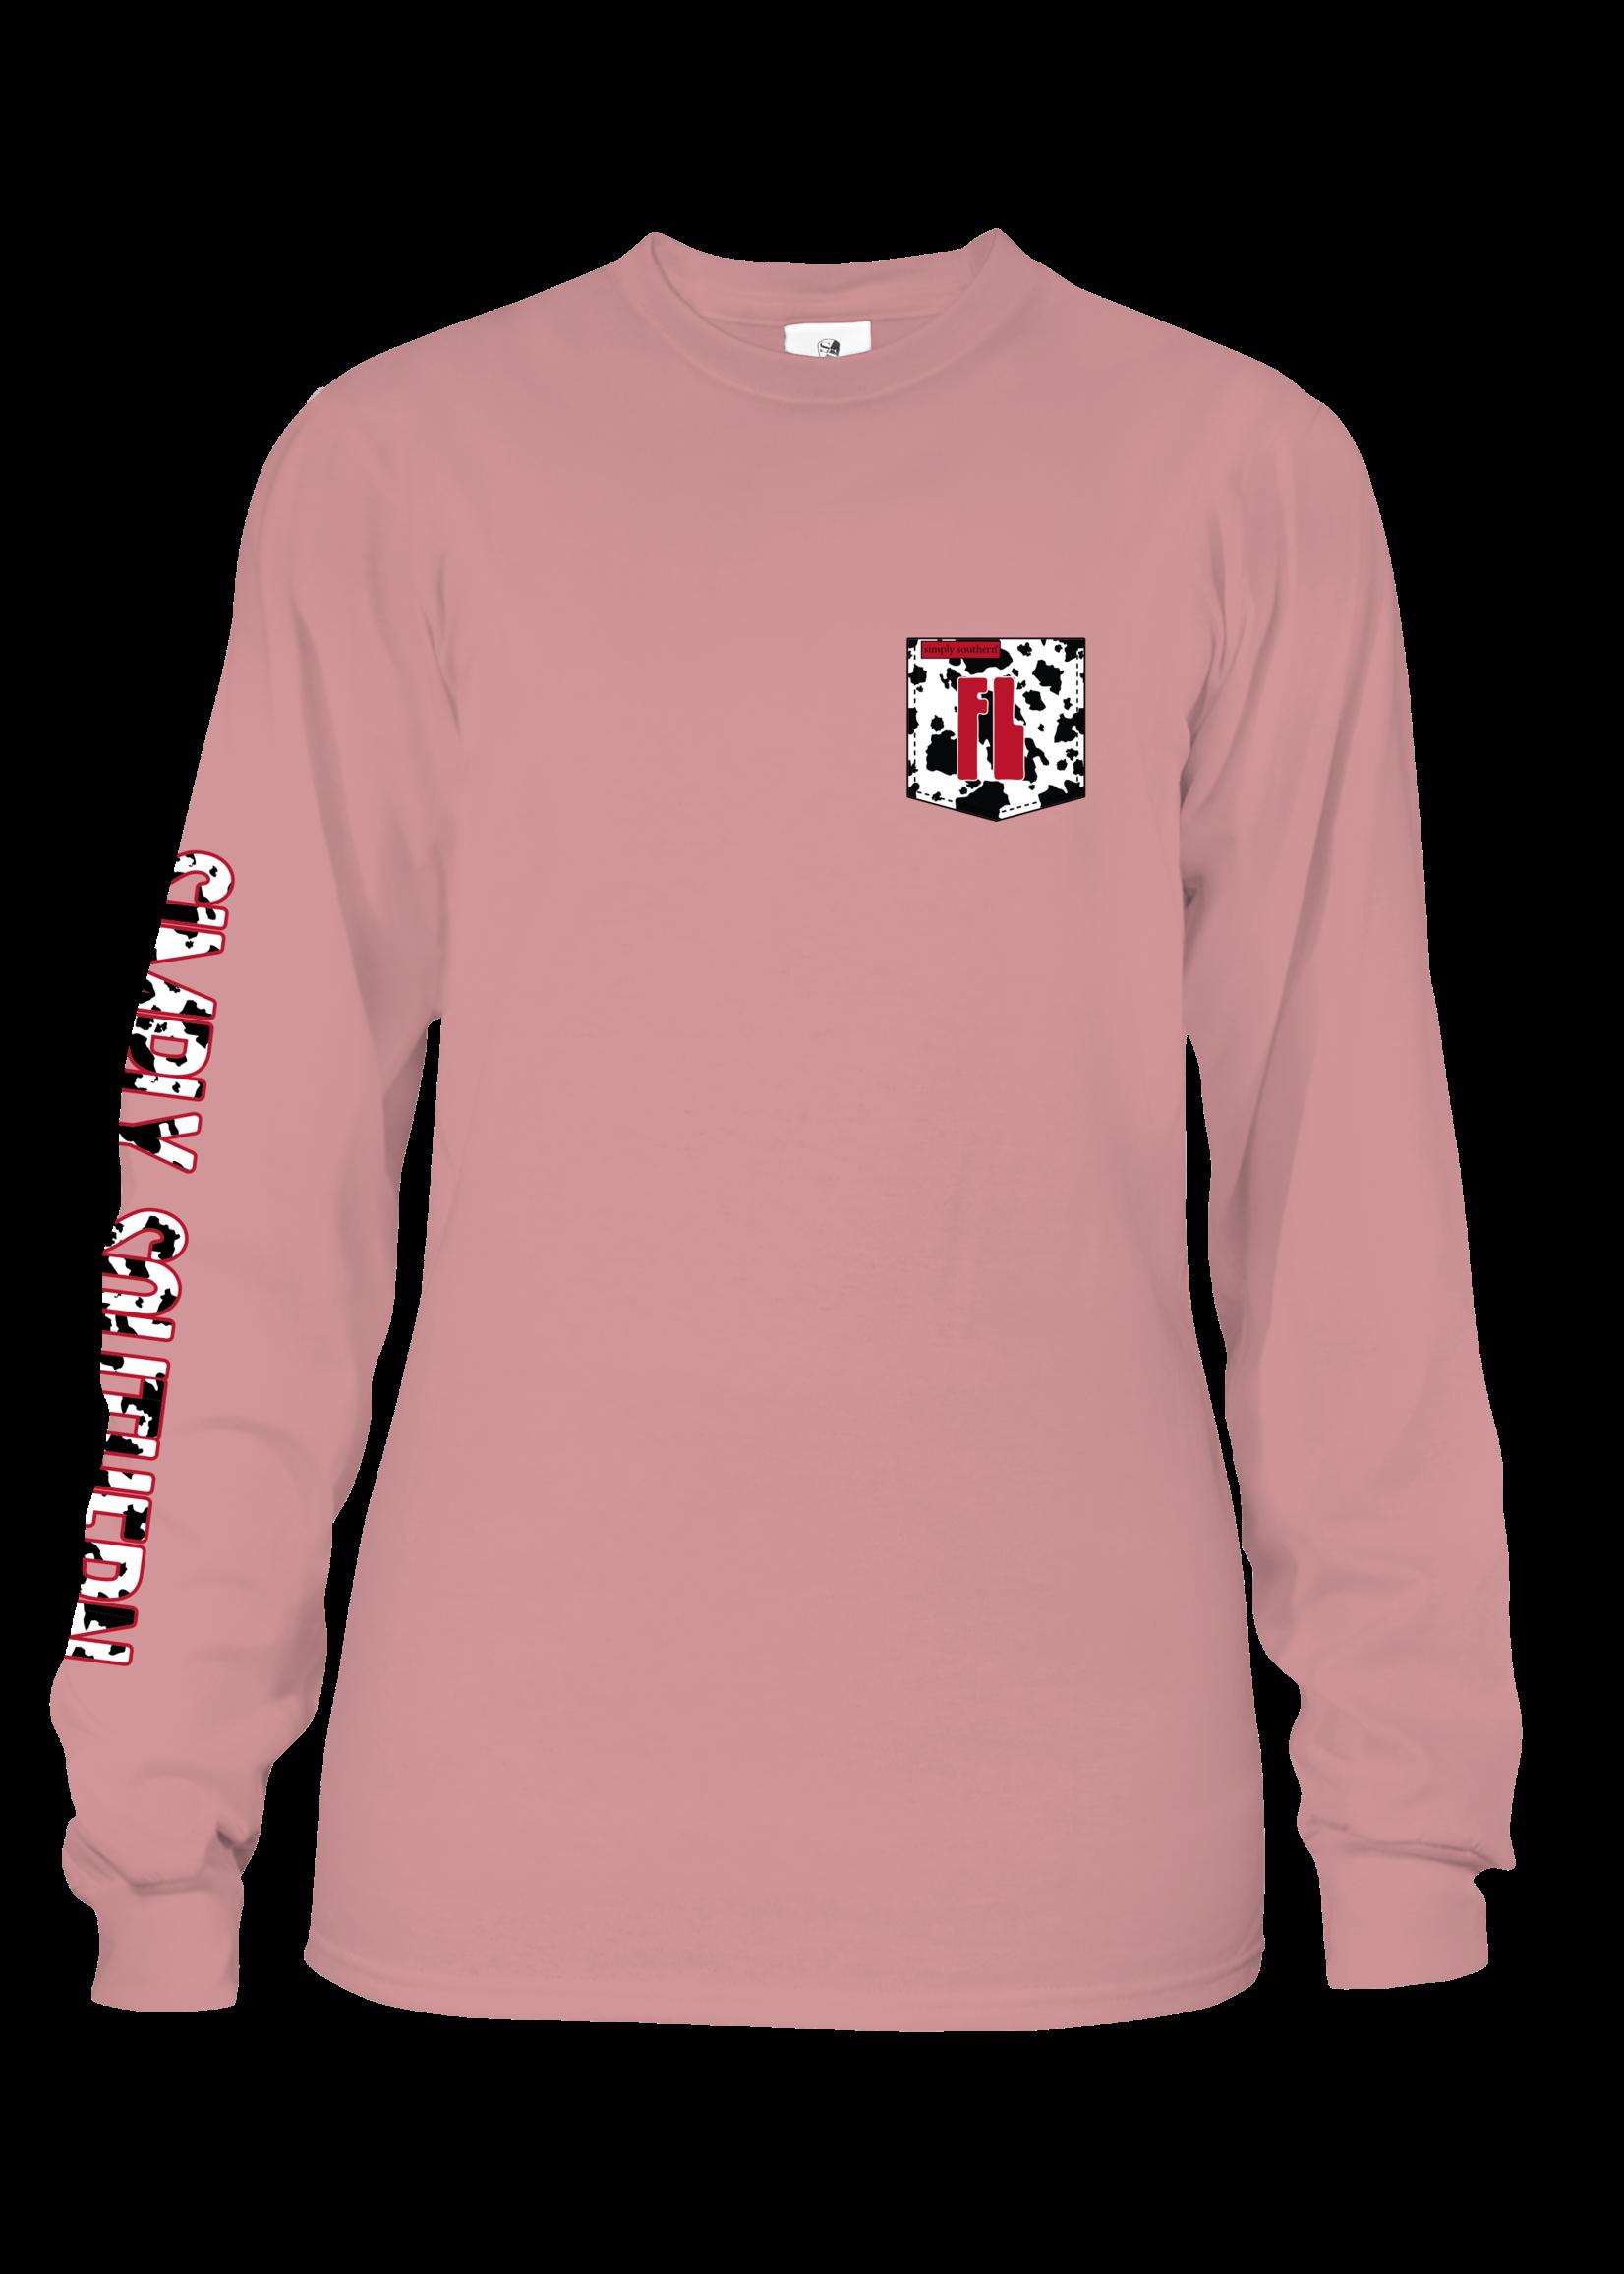 Simply Southern Collection Florida Girl Long Sleeve T-Shirt - Crepe